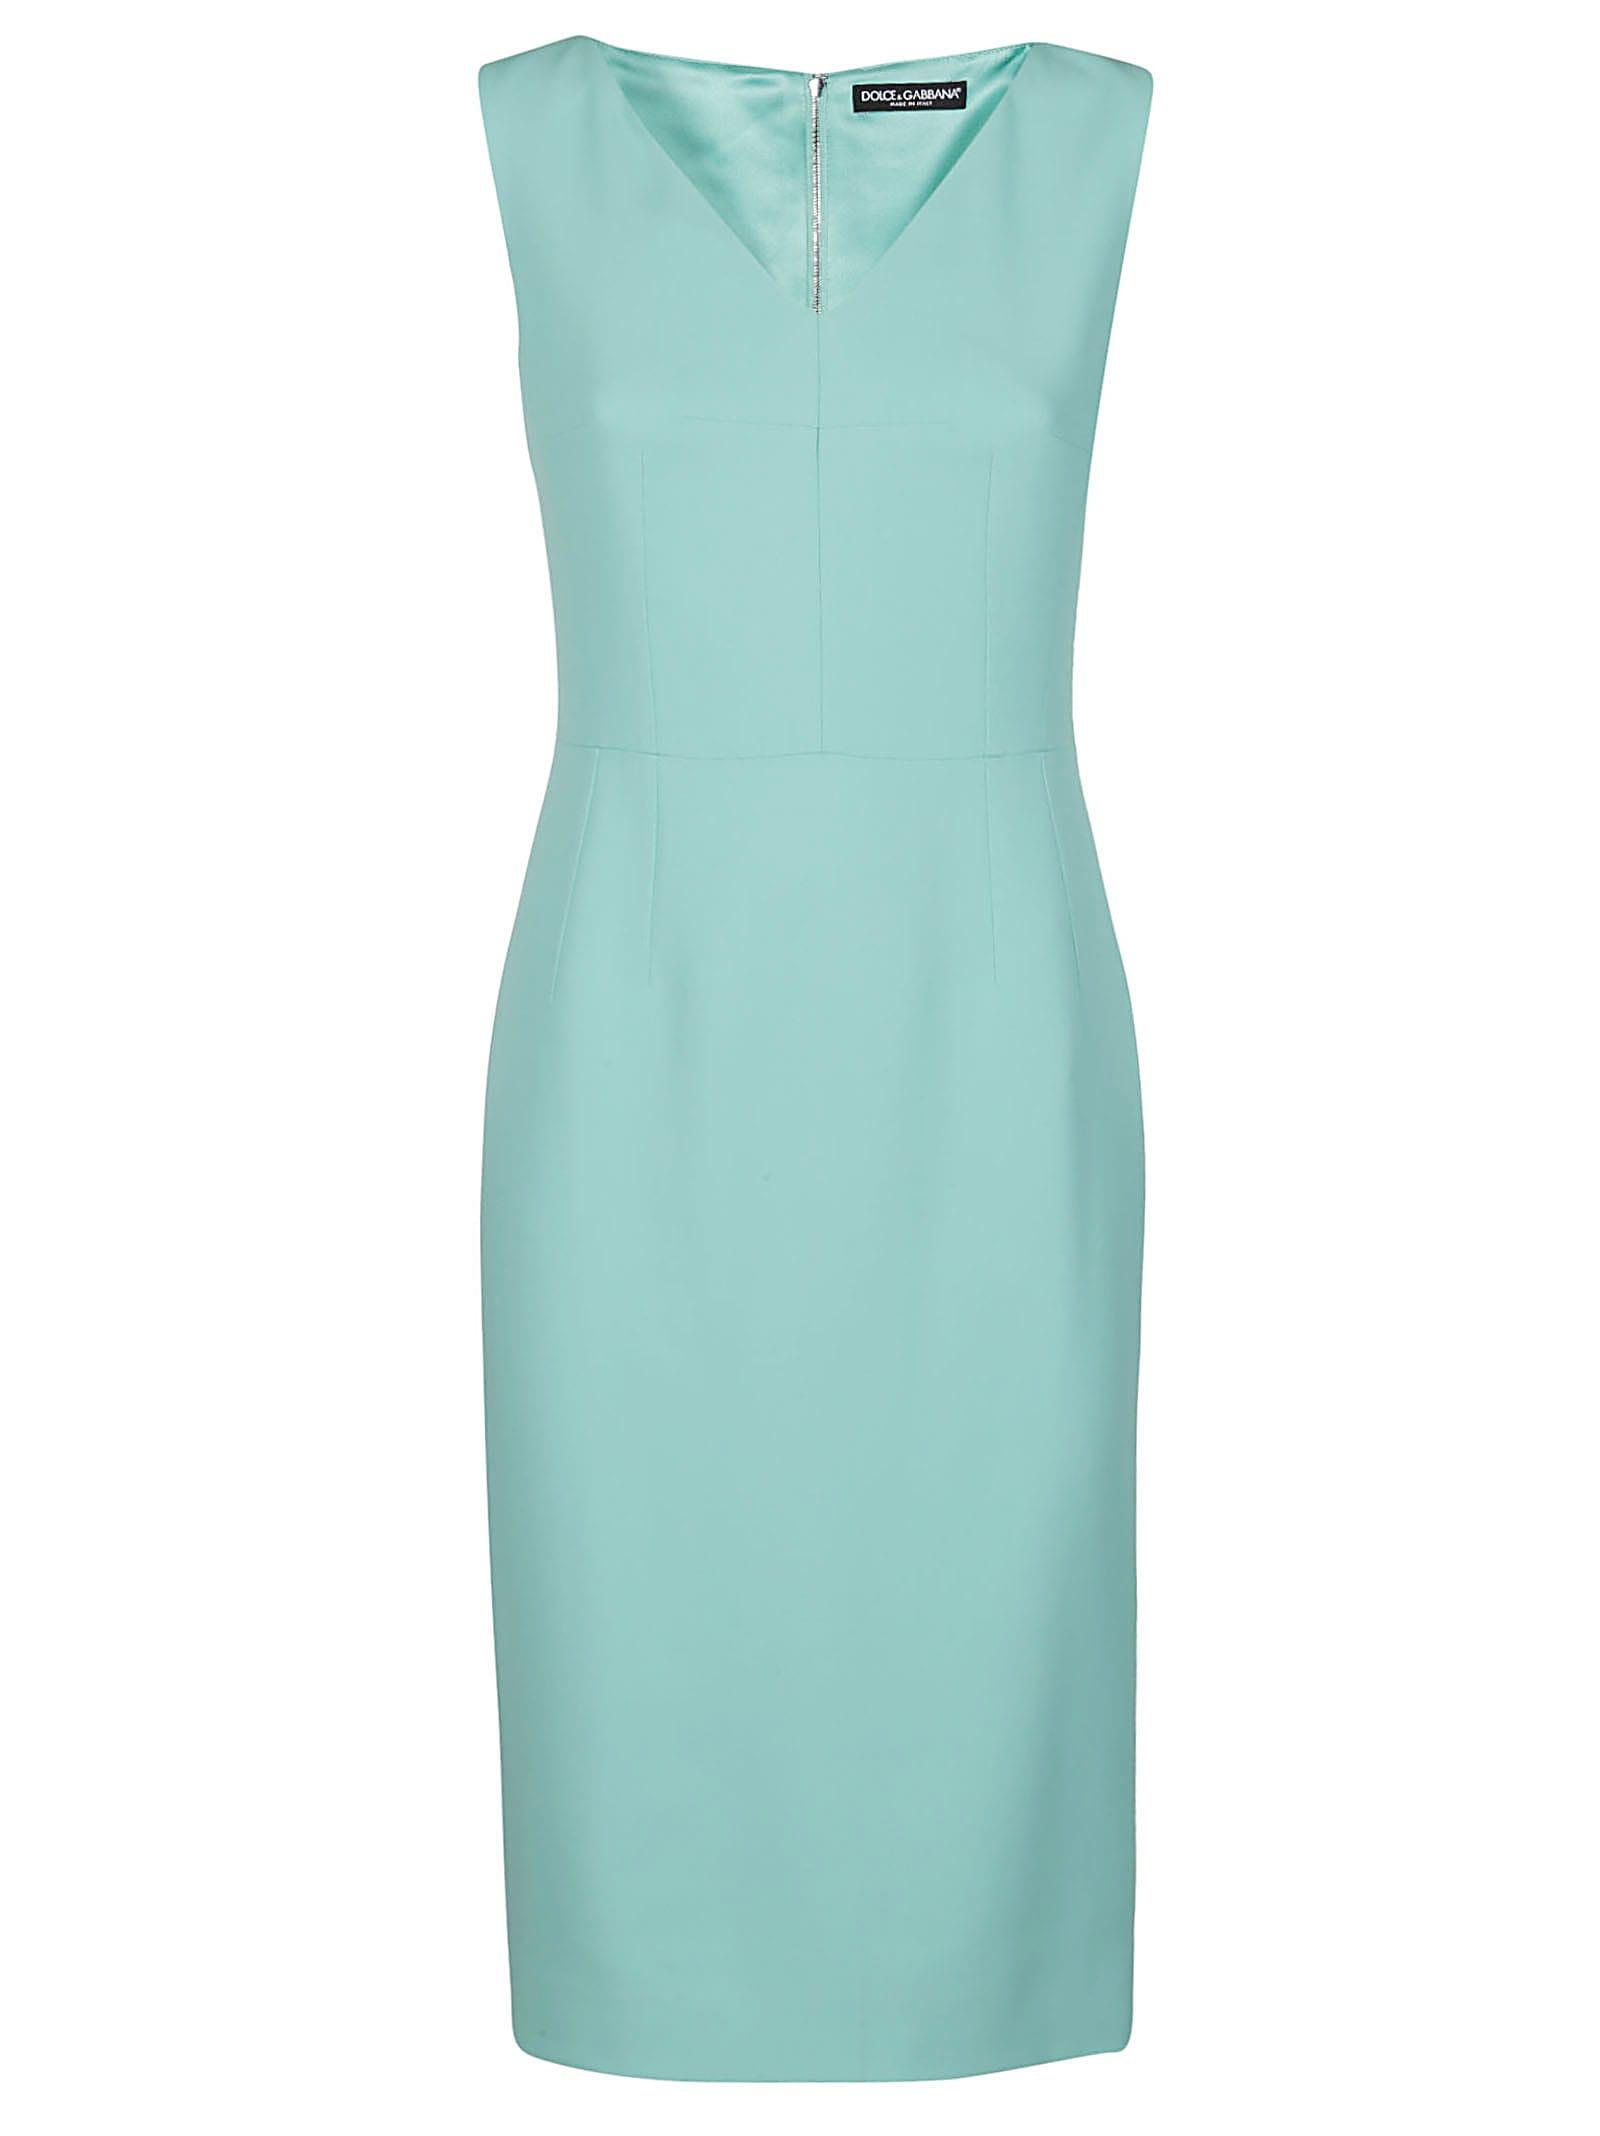 Buy Dolce & Gabbana Light Blue Viscose Blend Dress online, shop Dolce & Gabbana with free shipping